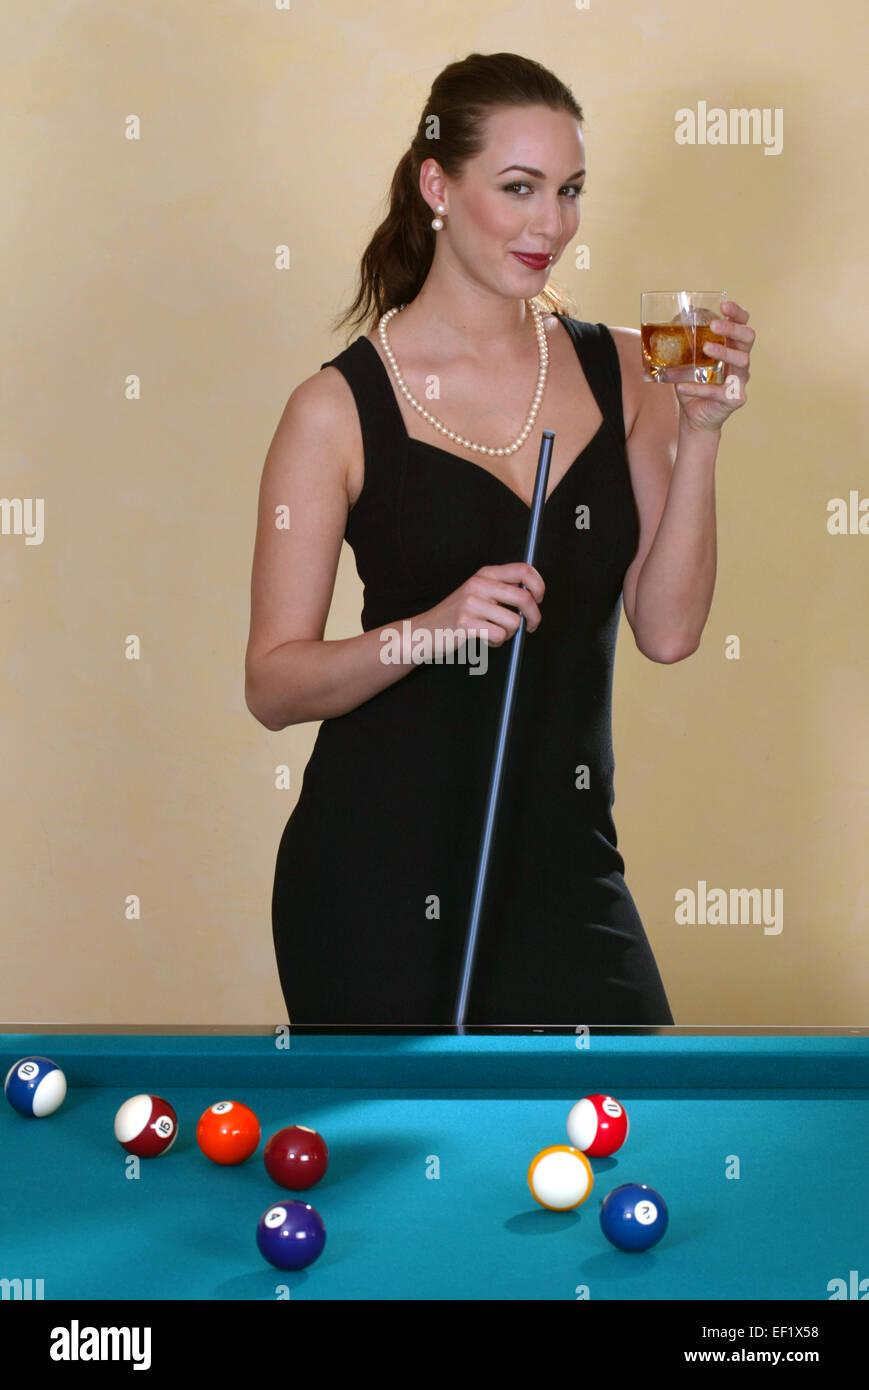 Elegante Frau spielt Billard, Frei f∏r Werbung (Modellfreigabe) - Stock Image